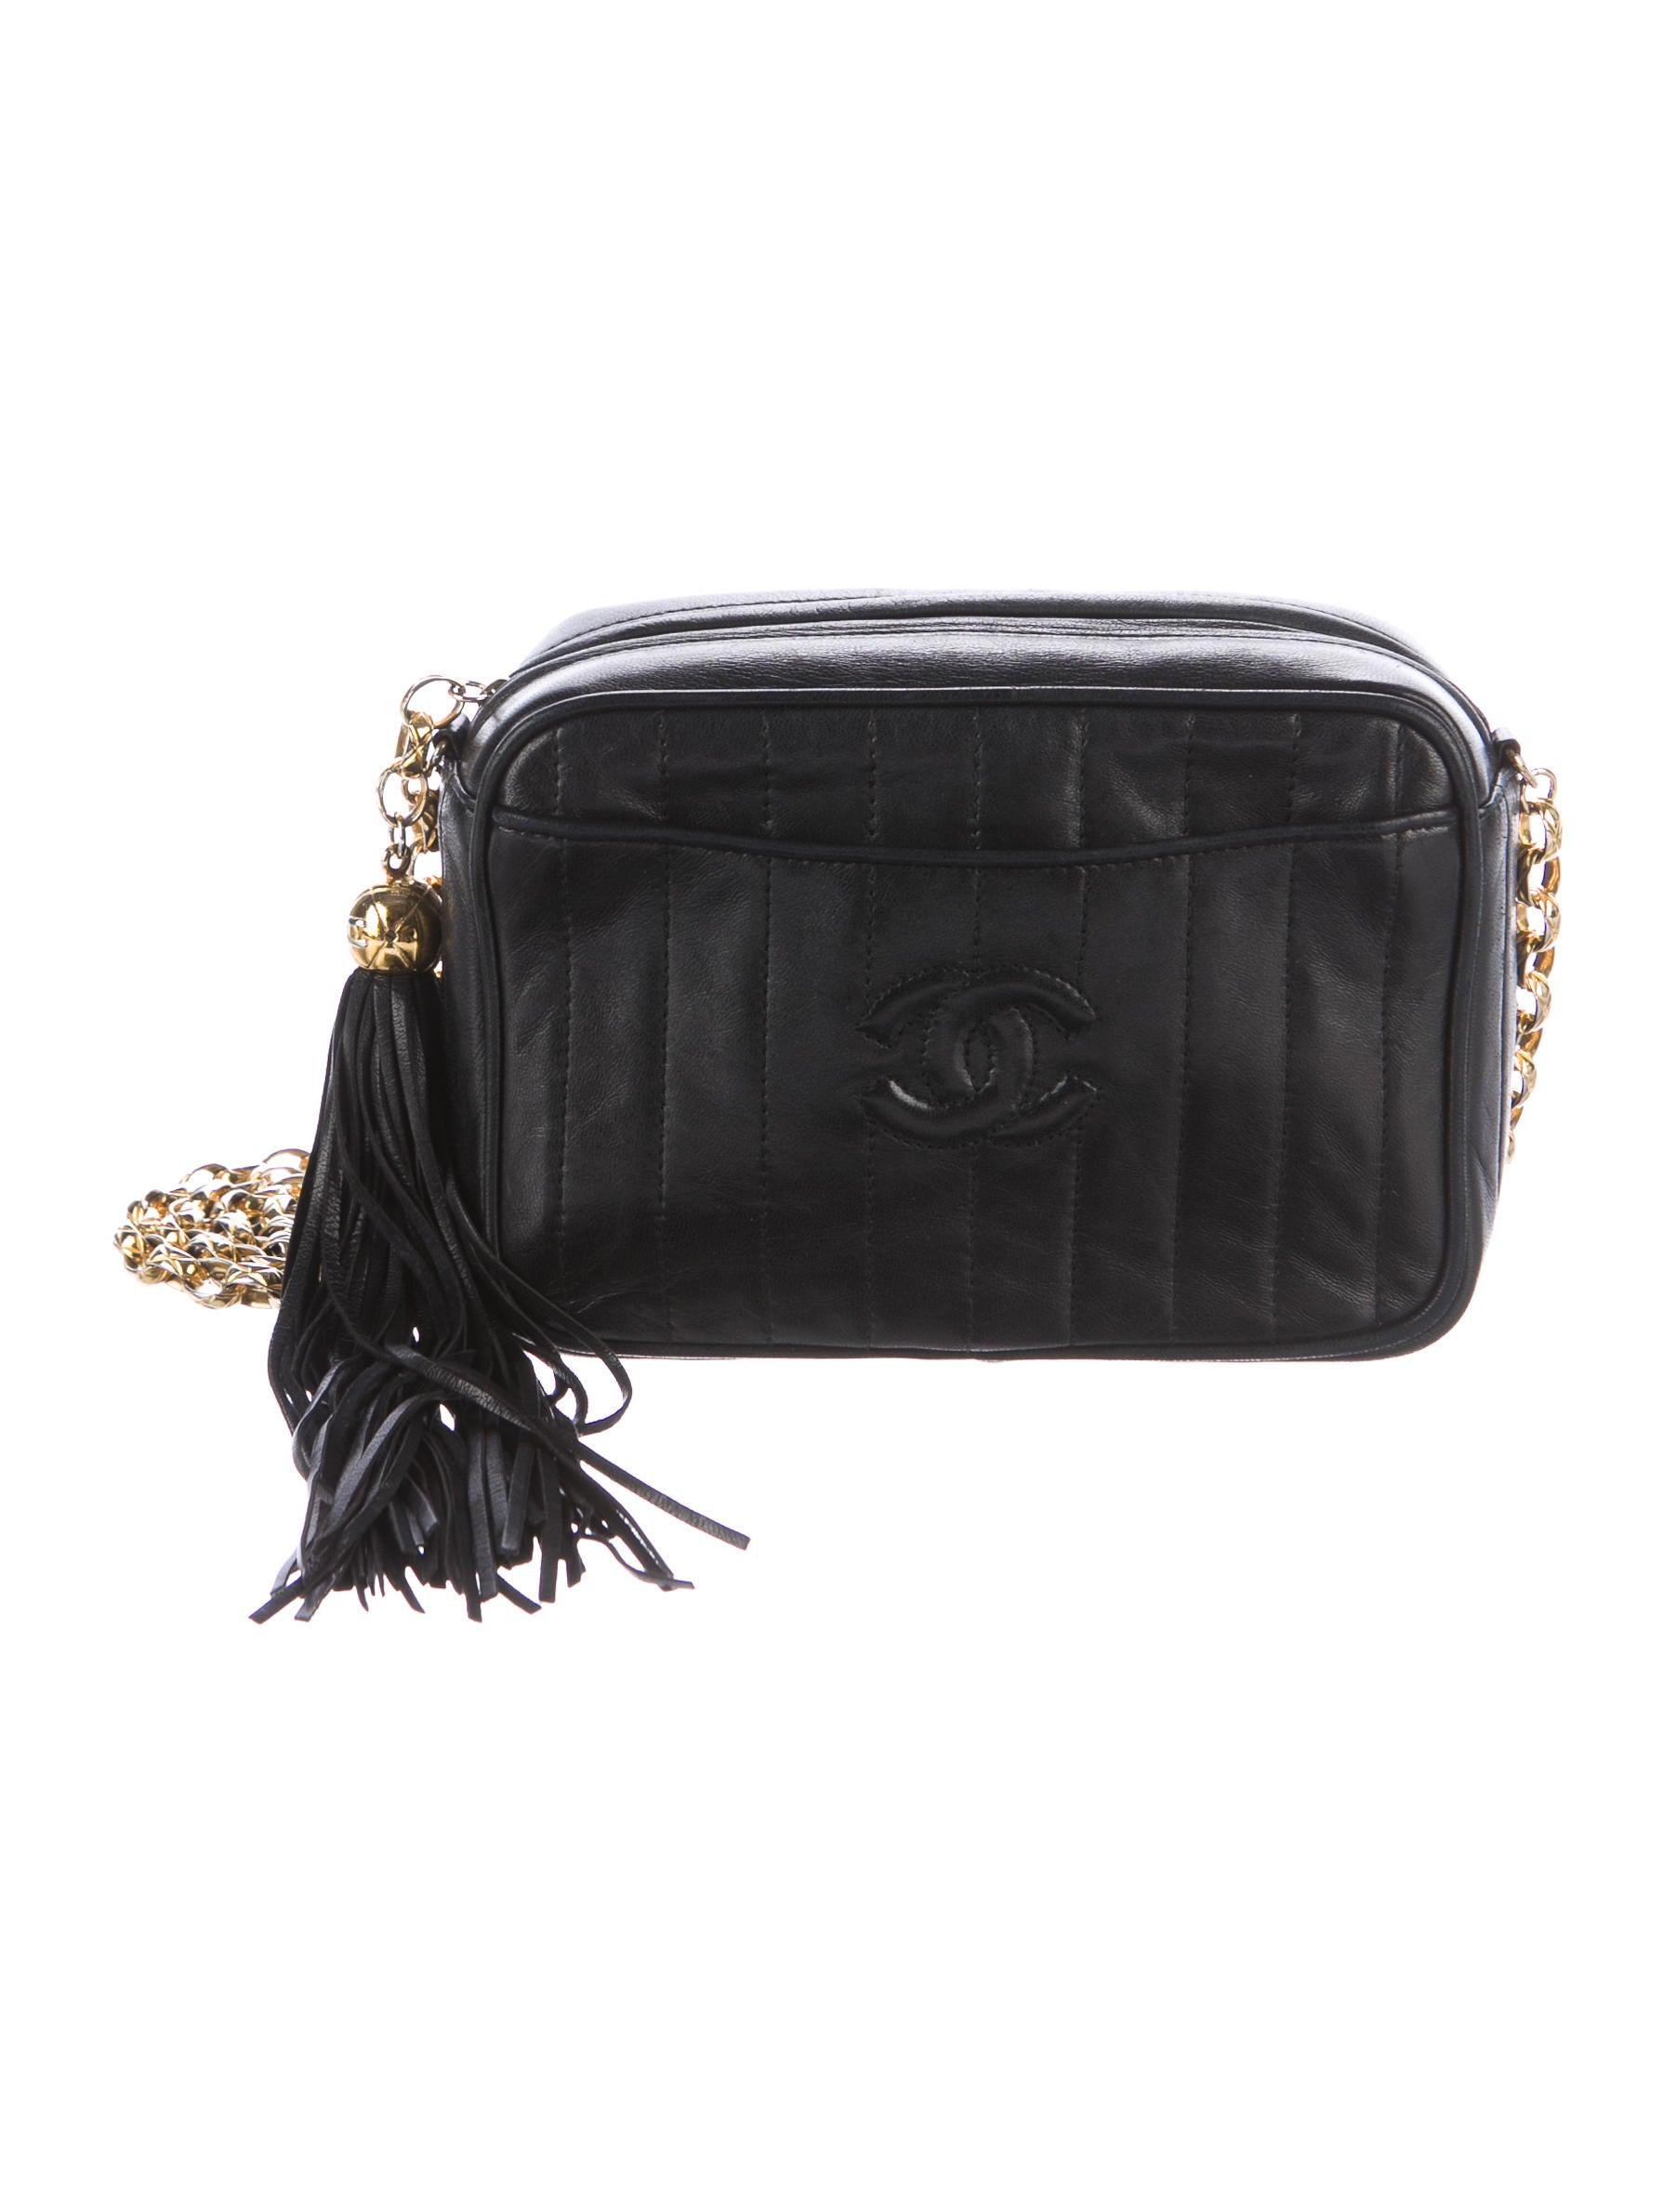 c4fc9a573d31 Vintage Chanel Camera Bag With Tassel | Stanford Center for ...